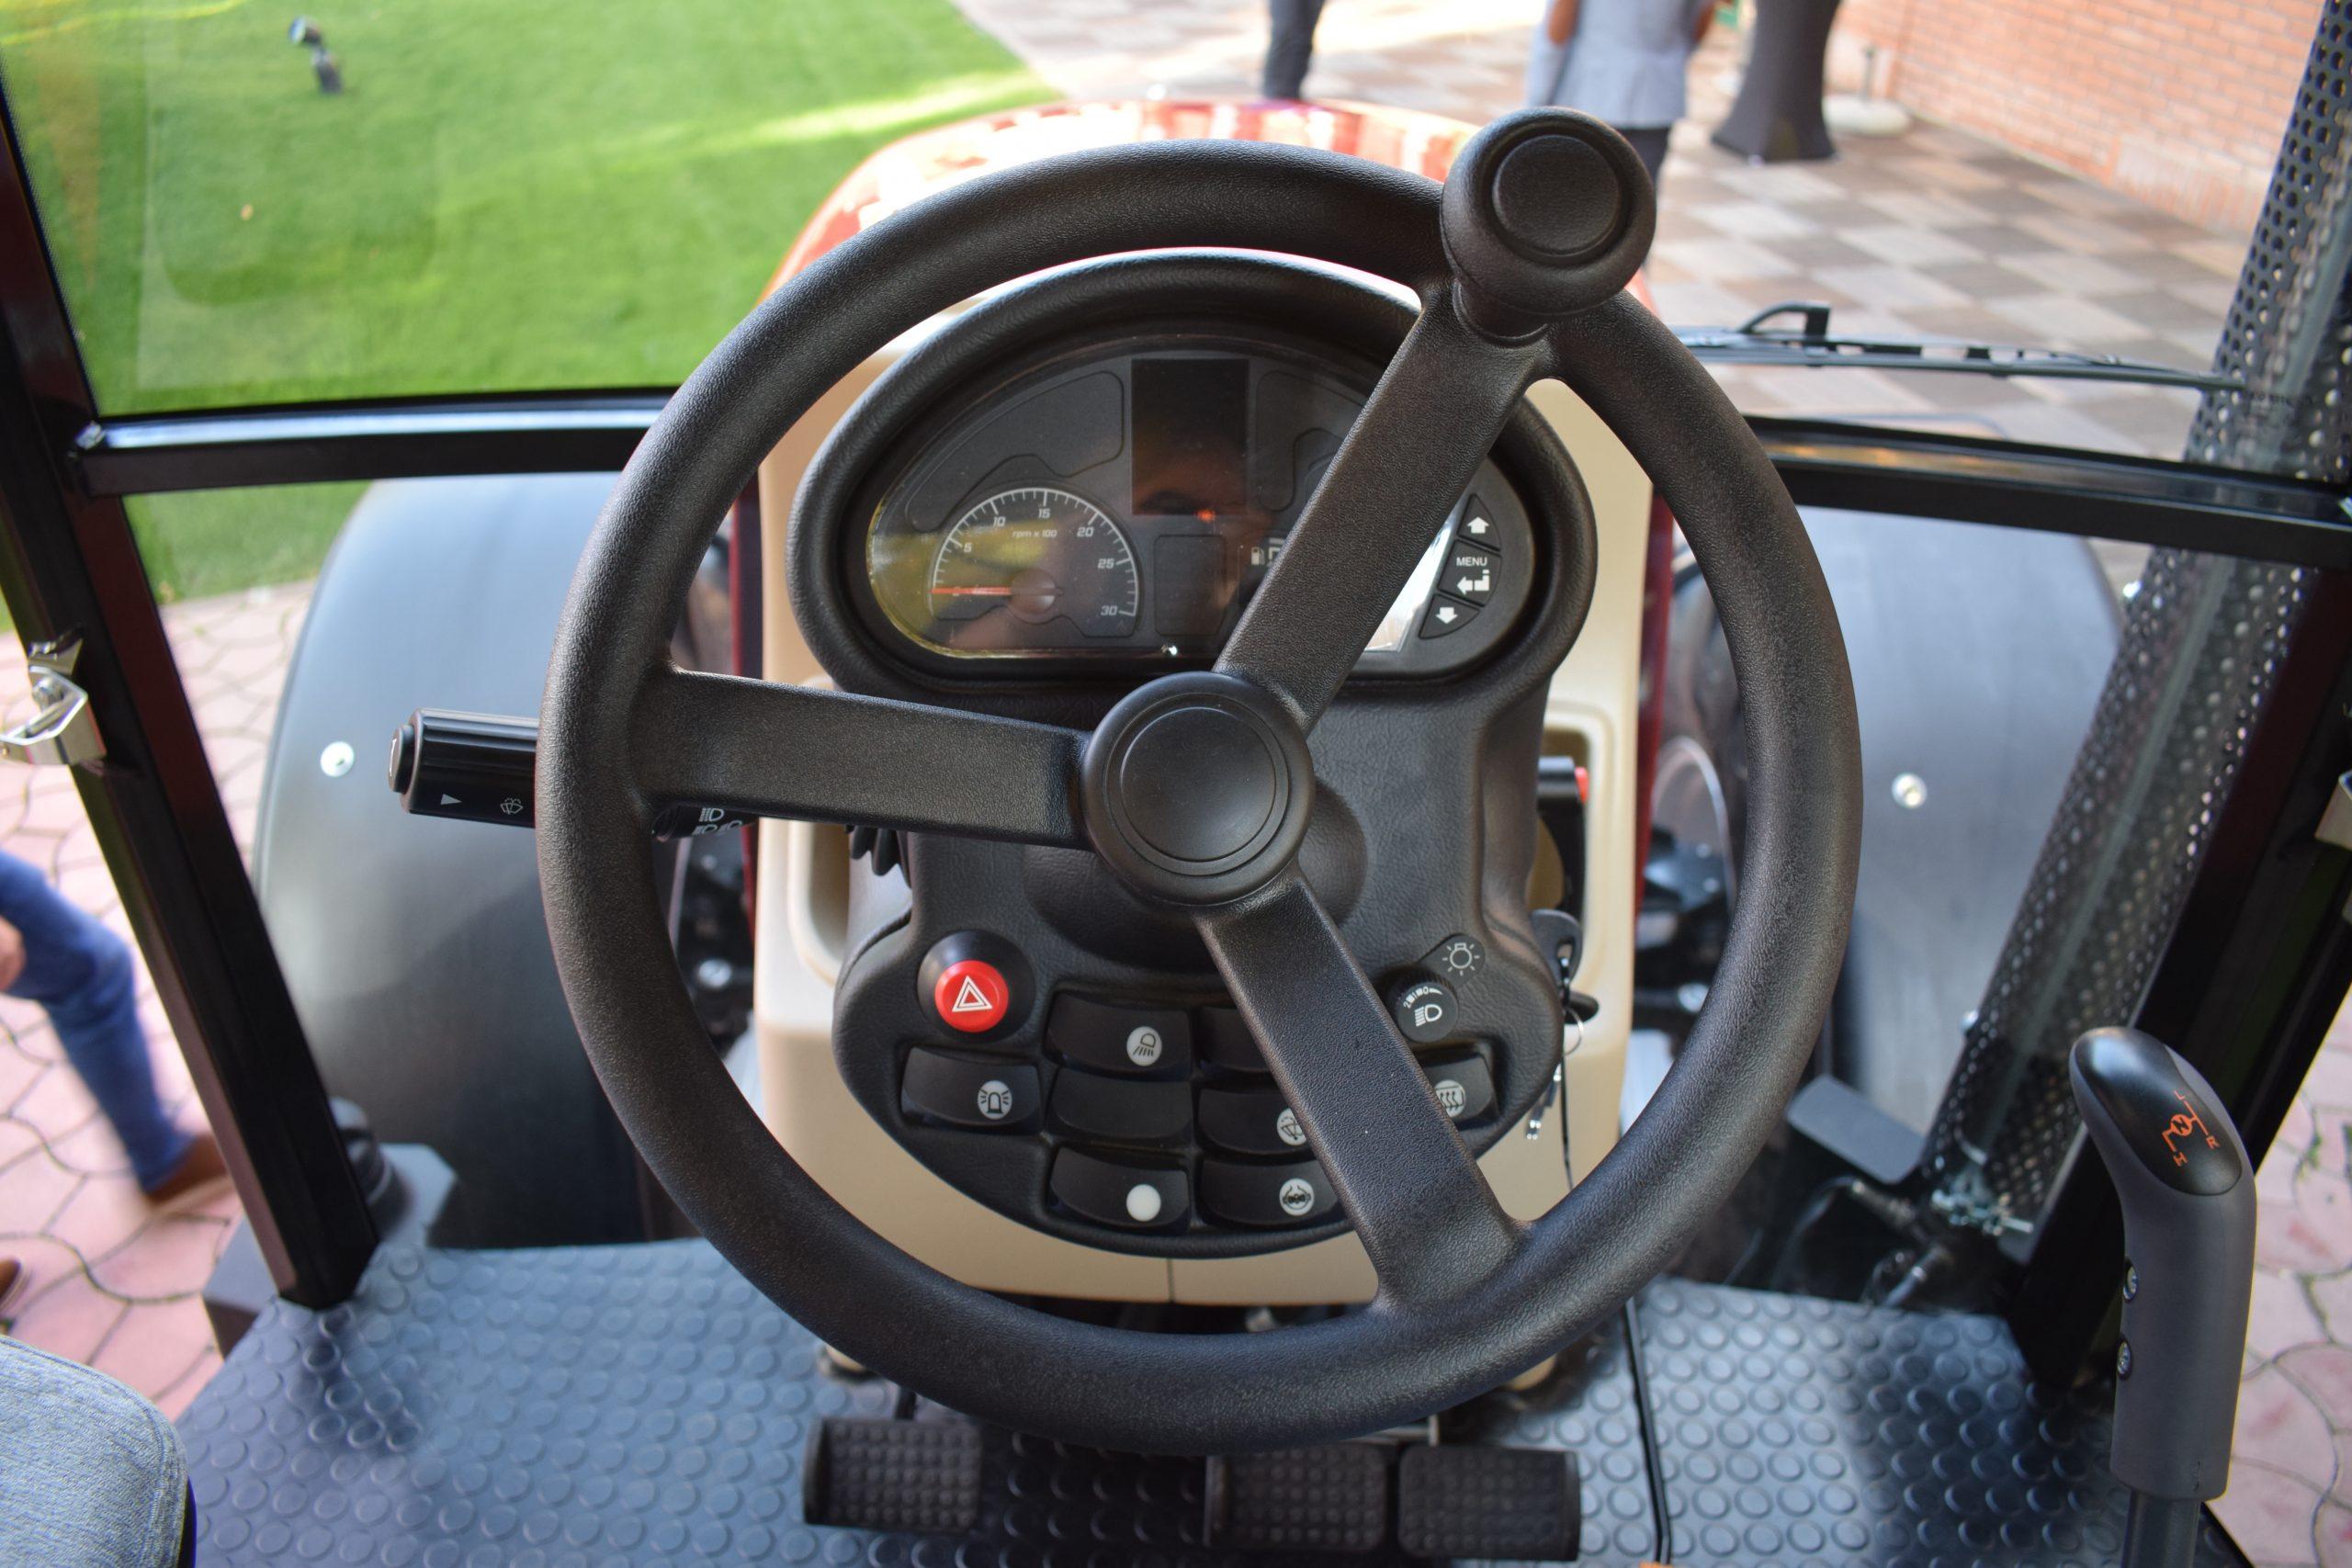 Tractor romanesc Tagro Irum volan